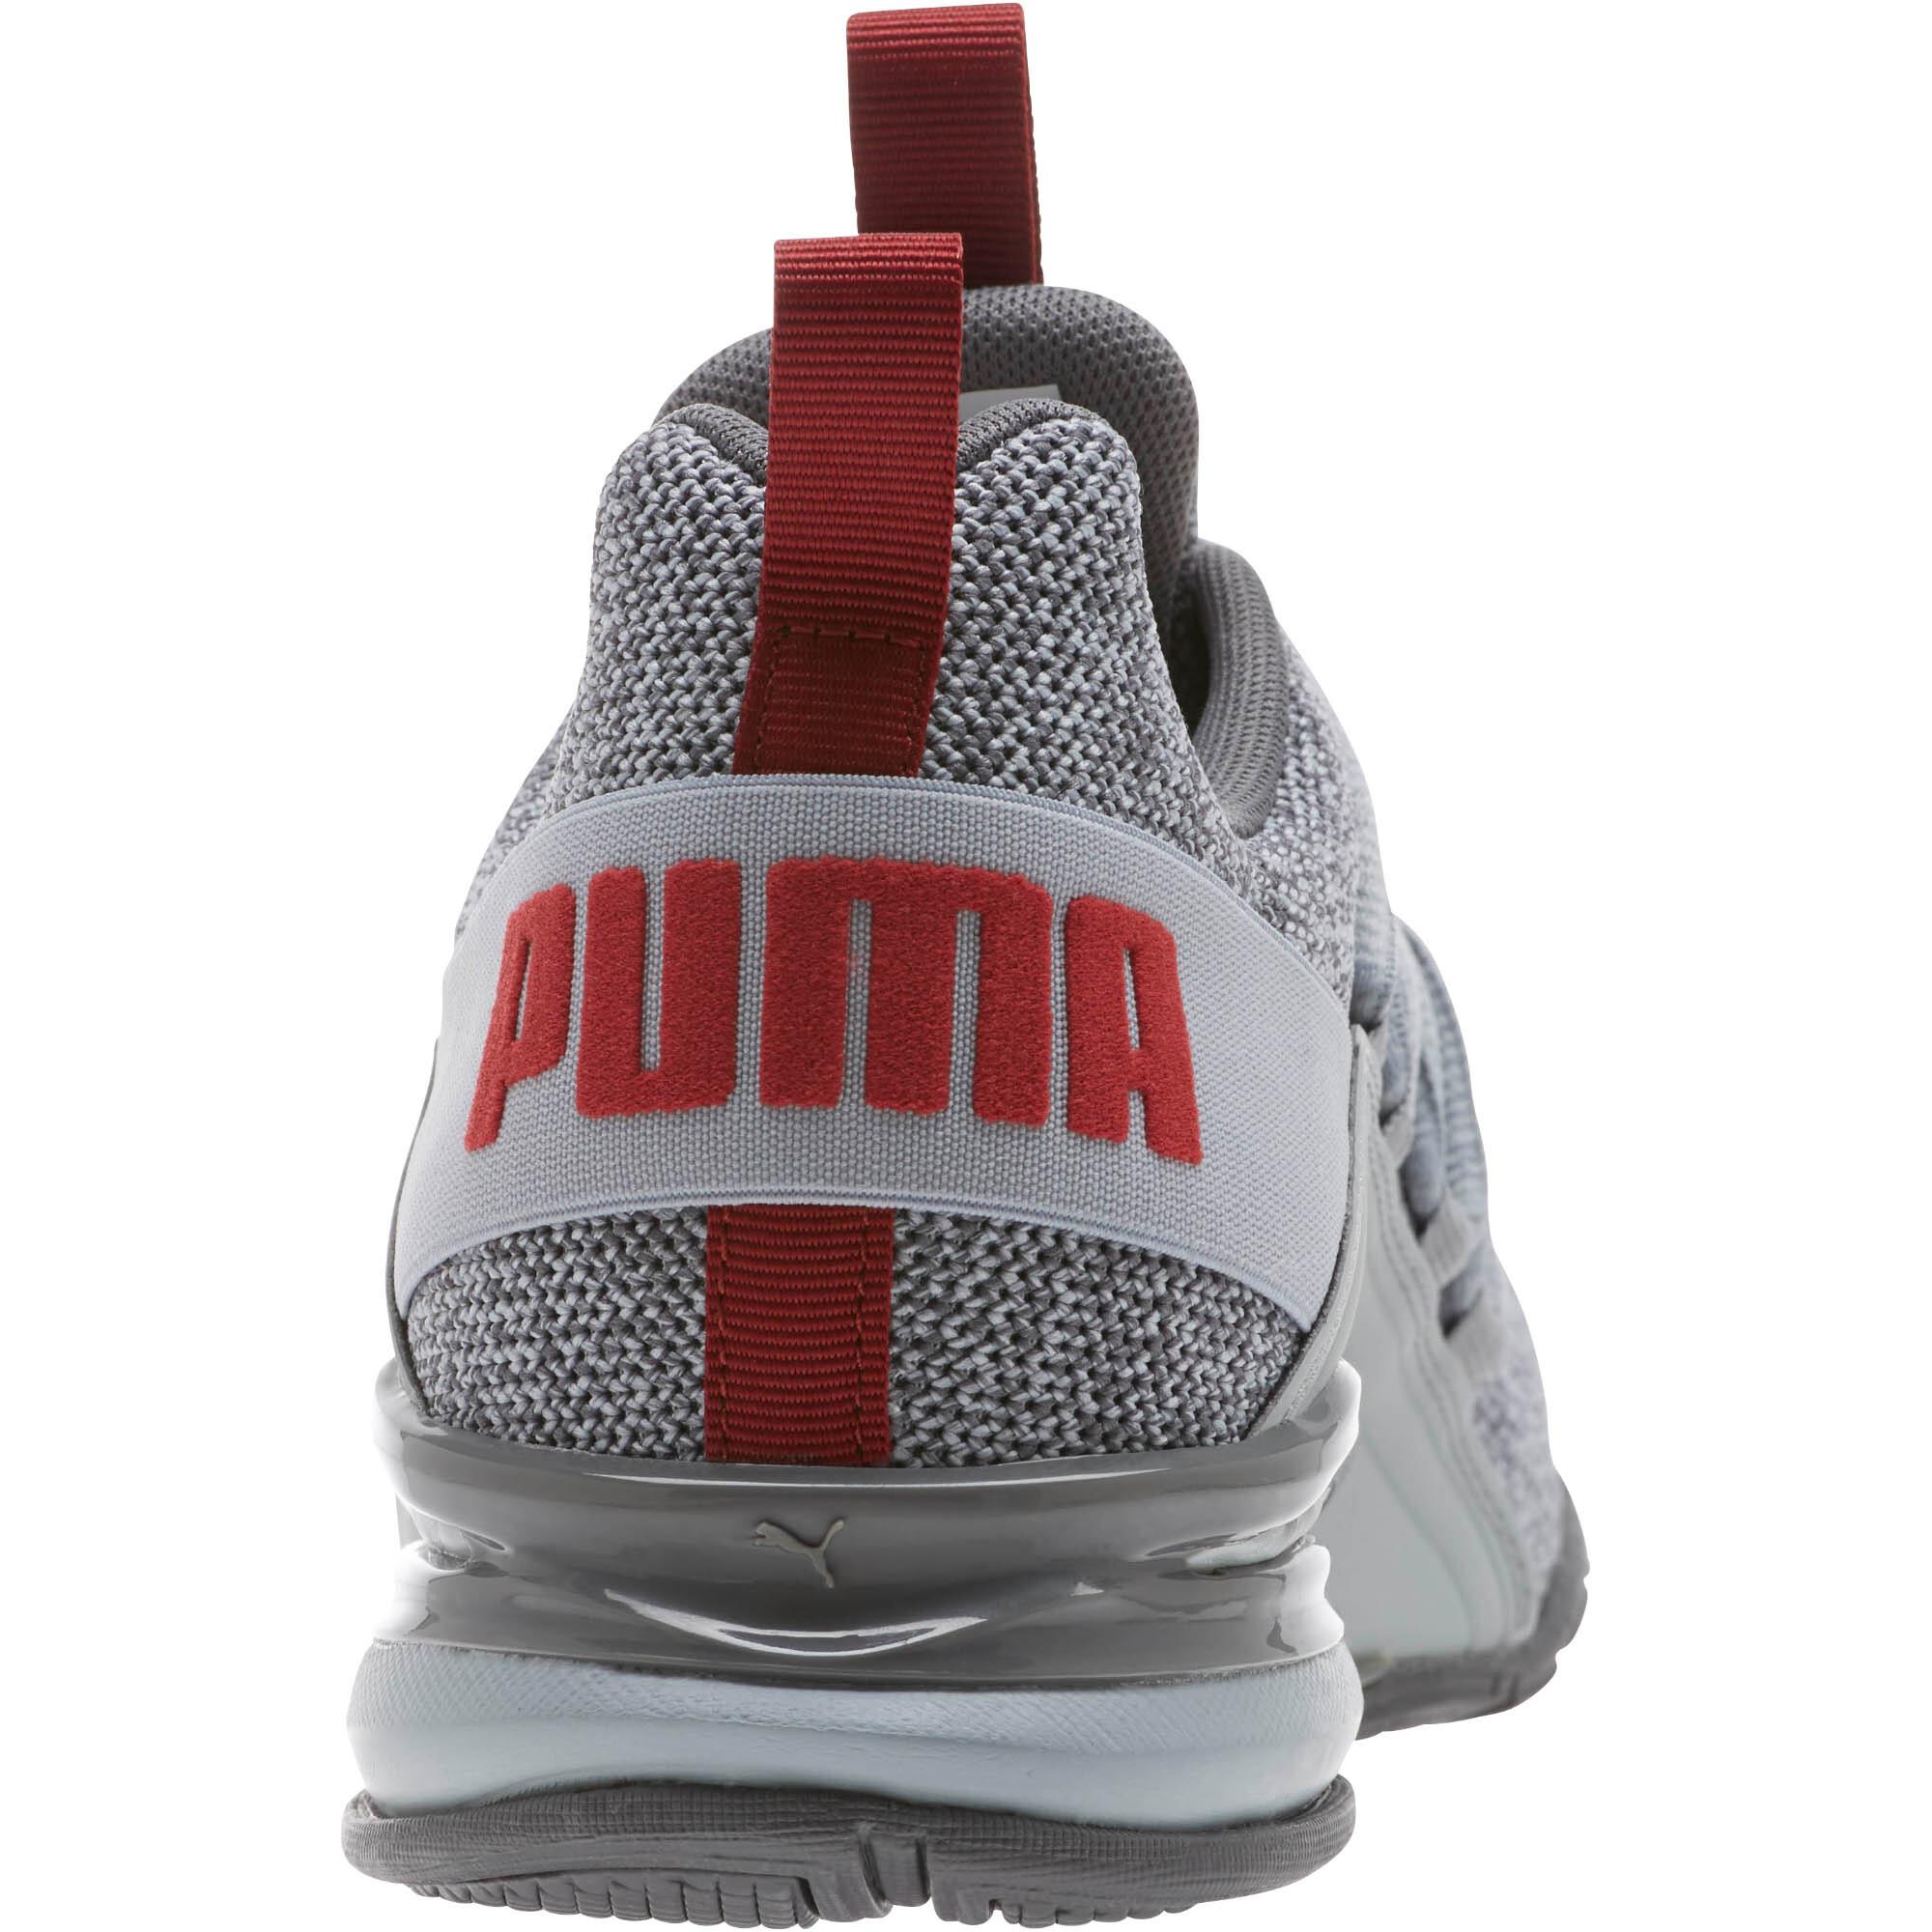 PUMA-Axelion-Men-039-s-Training-Shoes-Men-Shoe-Running thumbnail 4